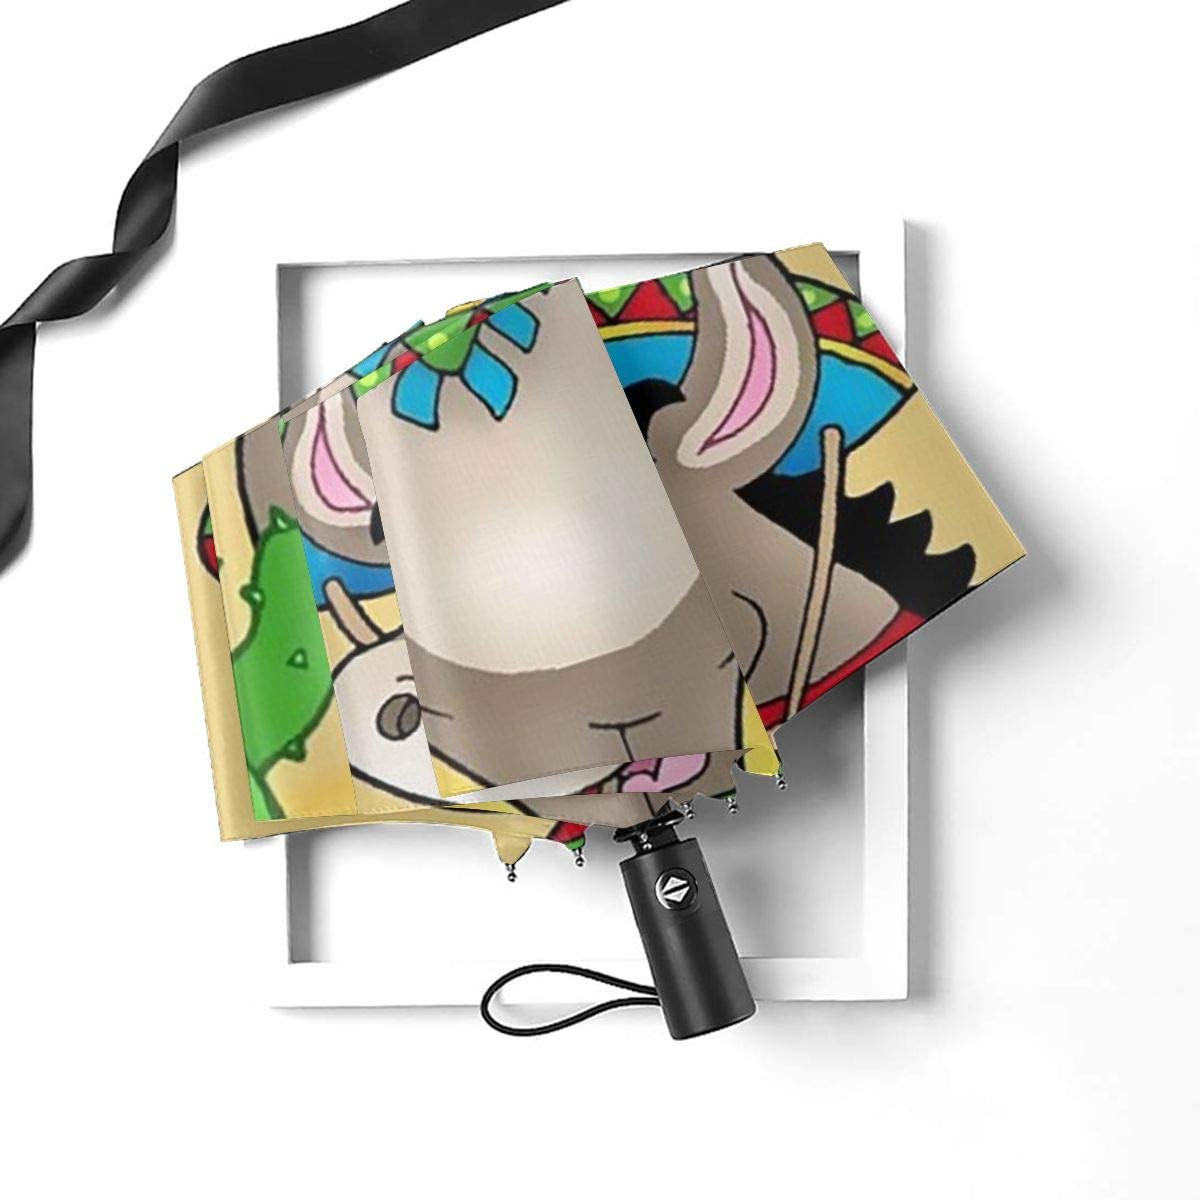 Mexican Donkey With Cactuses Umbrella Compact Rain/&Wind Repellent Umbrellas Sun Protection With Anti UV Coating Travel Auto Folding Umbrella